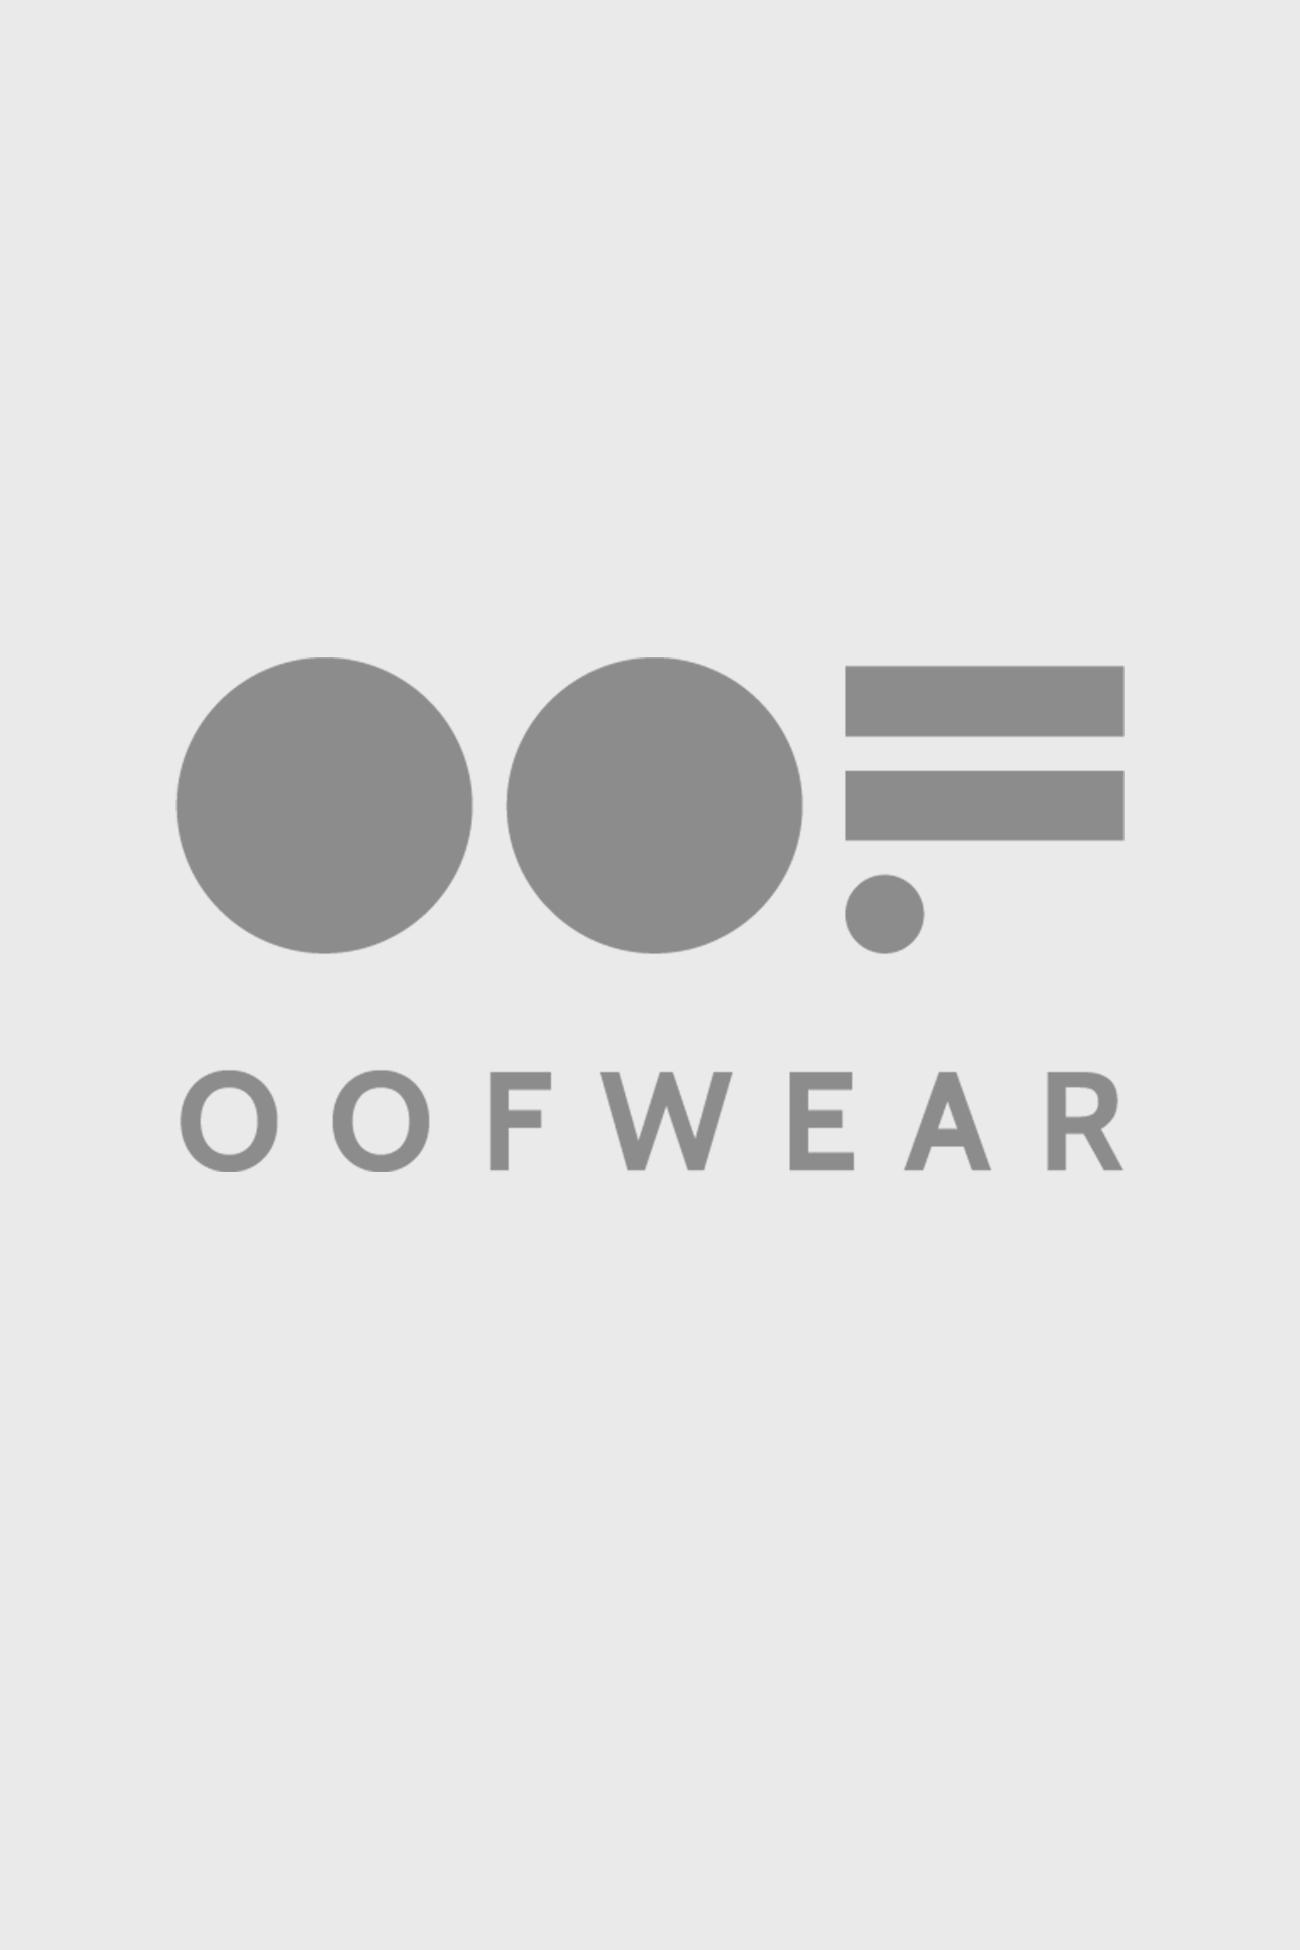 T-shirt 7001 in shiny fabric white